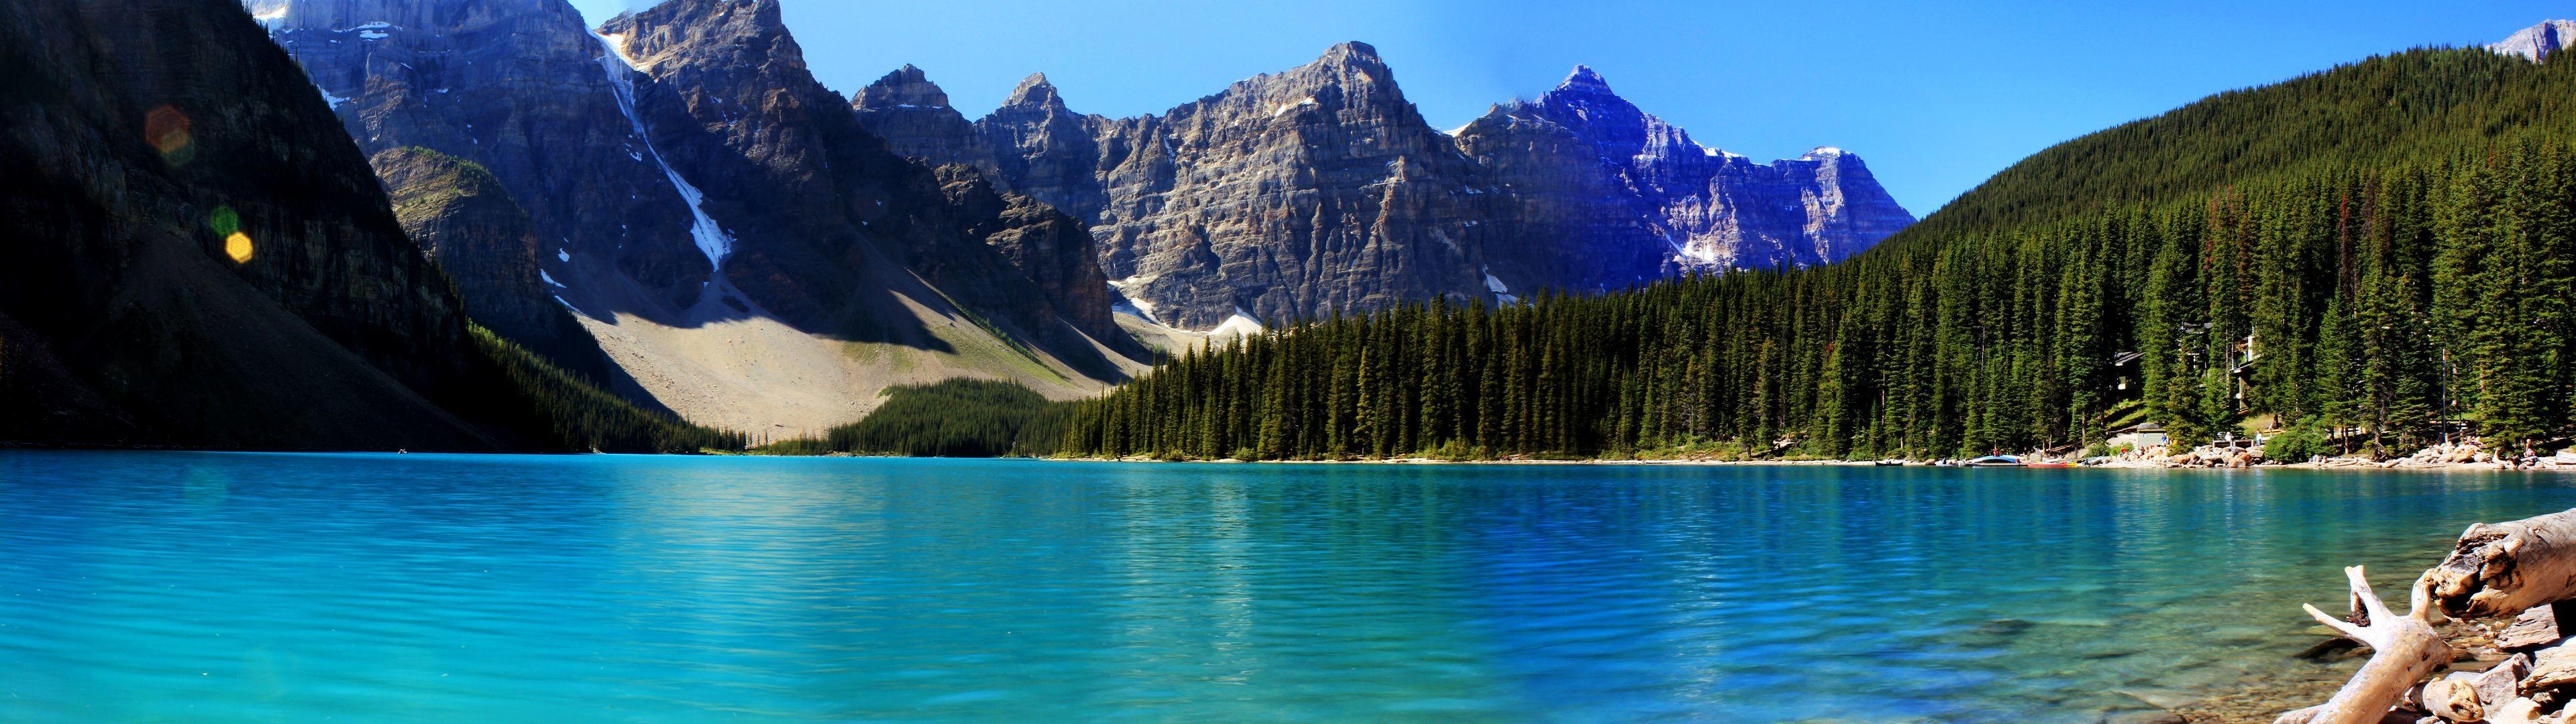 Mountain Lake Dual Screen Wallpaper